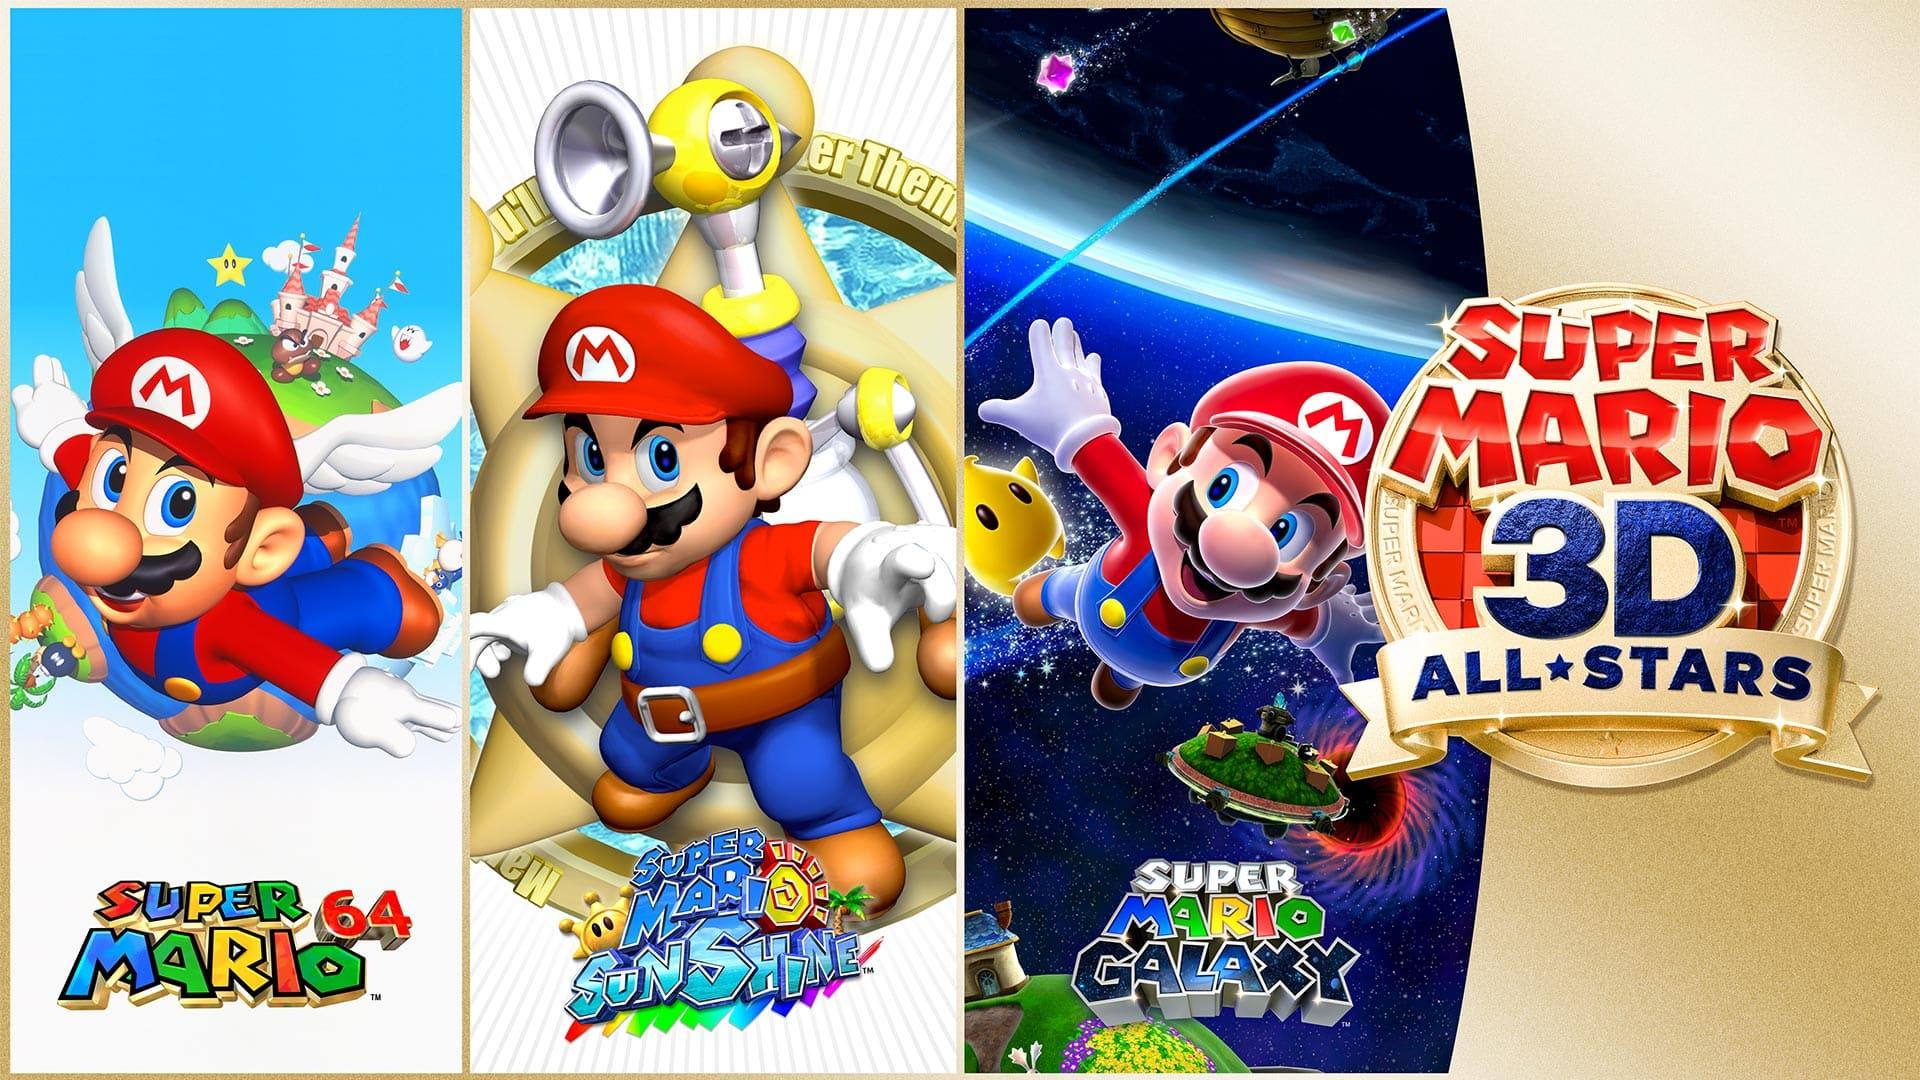 Super Mario 3D All-Stars facts and statistics